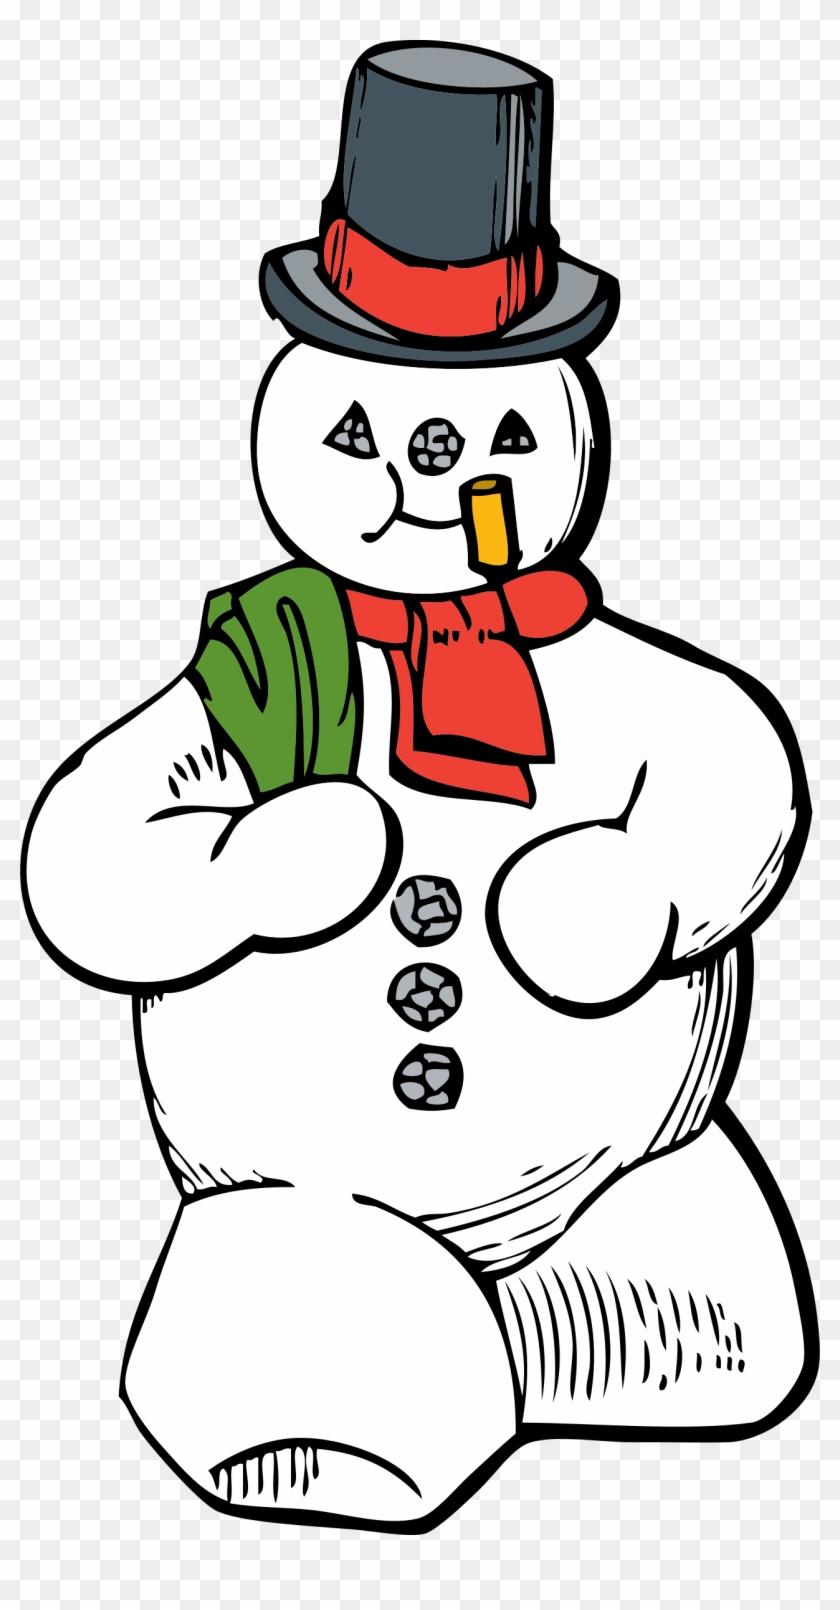 Snowman - Snowman Clip Art #150592